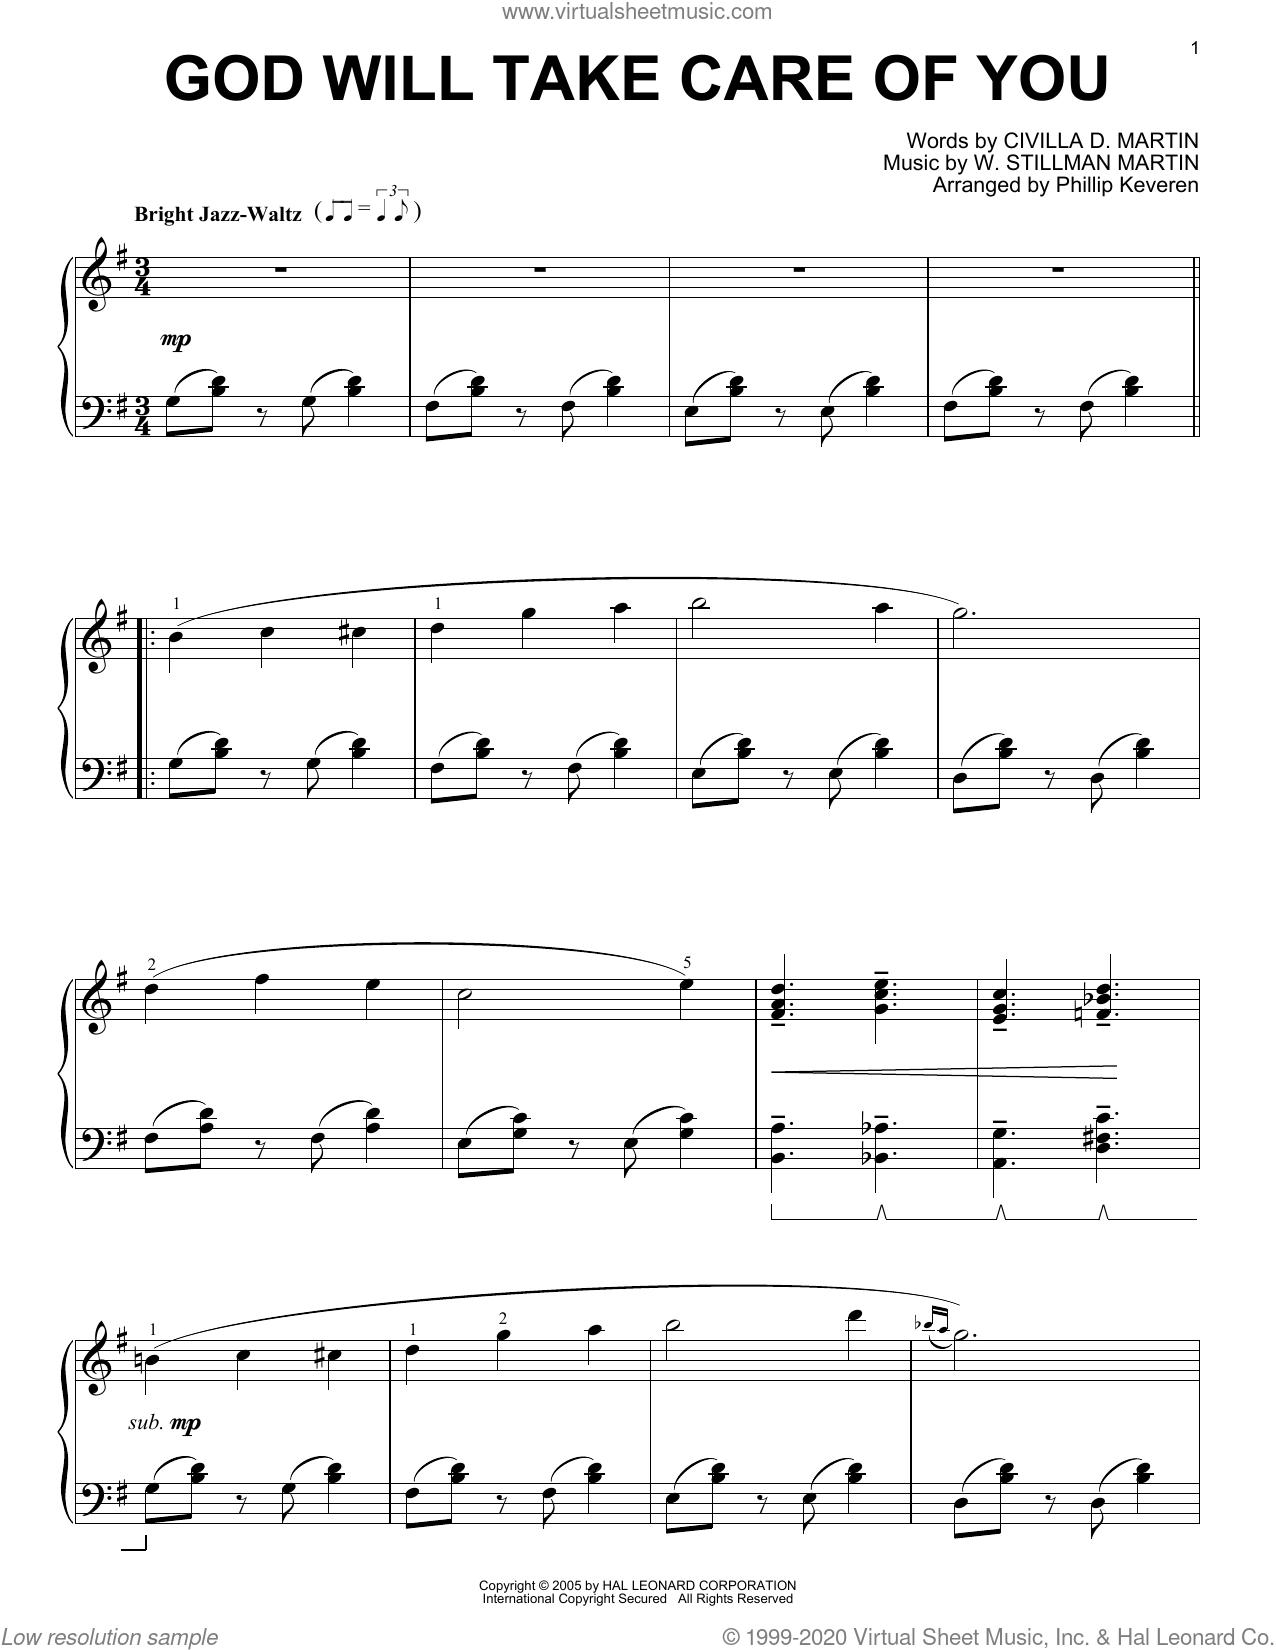 God Will Take Care Of You [Jazz version] (arr. Phillip Keveren) sheet music for piano solo by Civilla D. Martin, Phillip Keveren and W. Stillman Martin, intermediate skill level